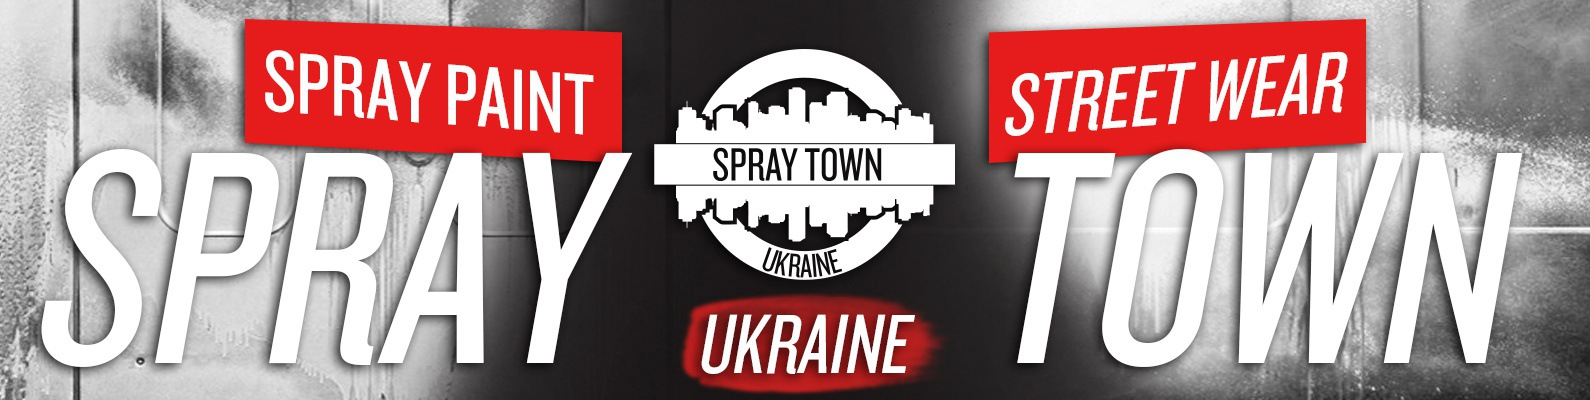 0b743b51 Spray Town - граффити, одежда, кроссовки Украина | ВКонтакте